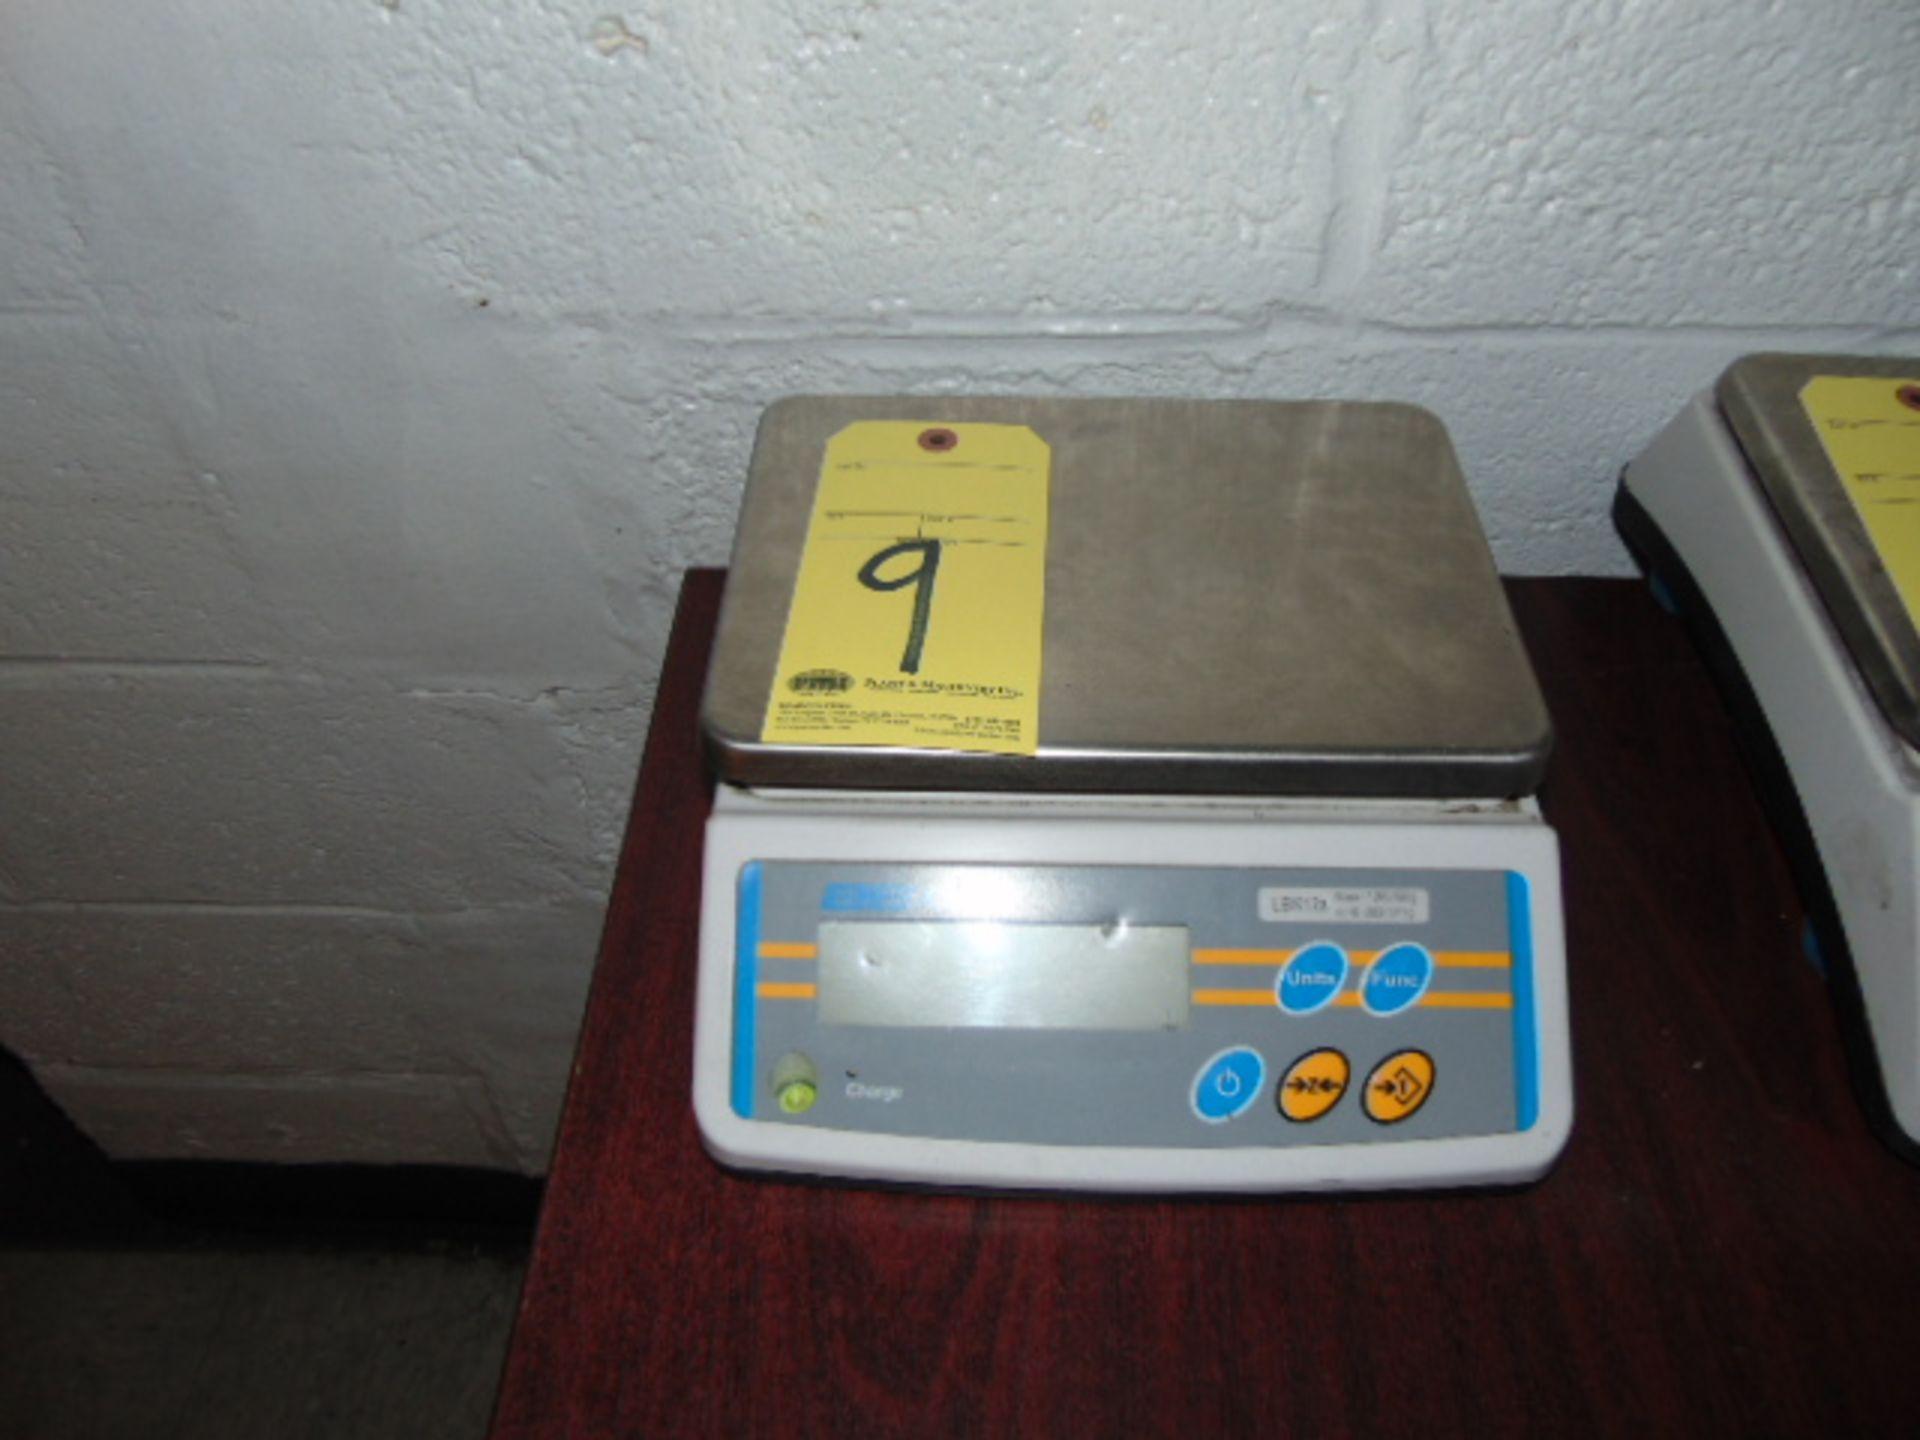 ELECTRONIC BENCH TOP SCALE, ADAM MDL LBK12A, 12 lb. cap.